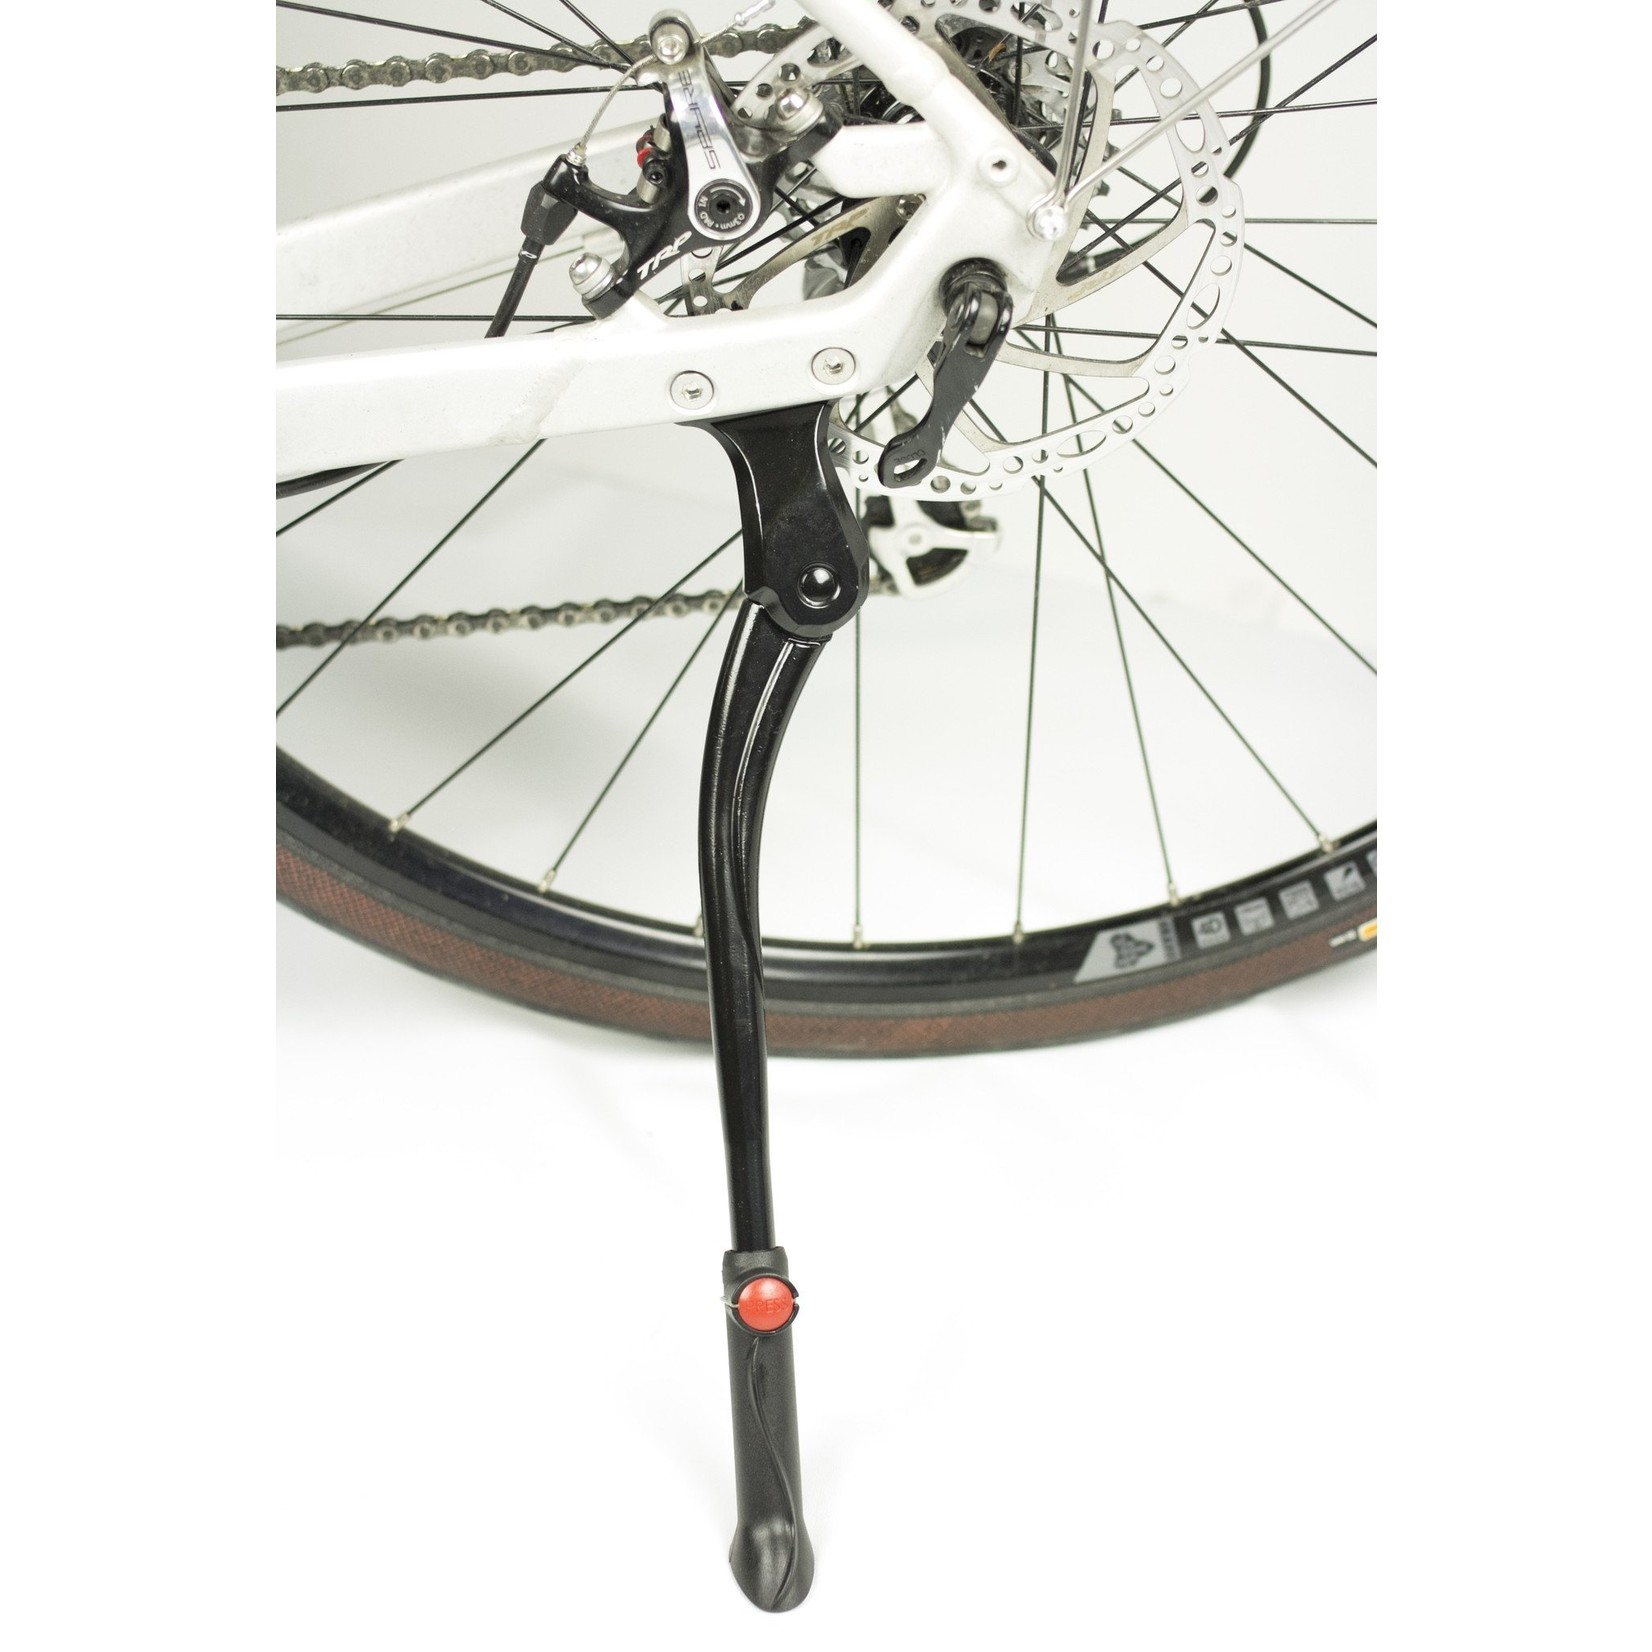 Marin Marin Bikes Specific Kickstand